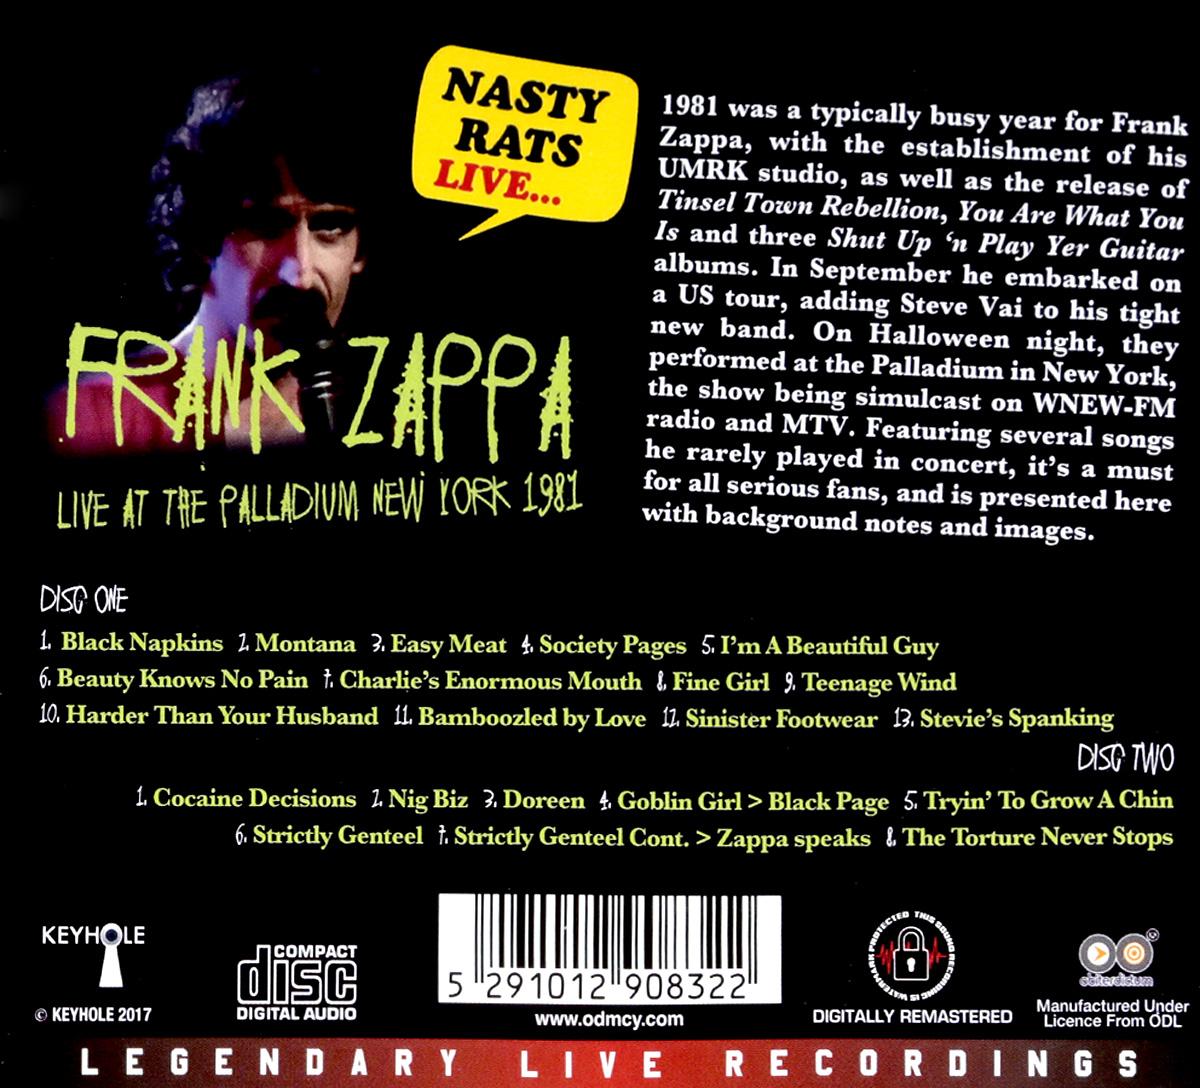 Frank Zappa.  Nasty Rats Live. . .  Live At The Palladium New York 1981 (2 CD)